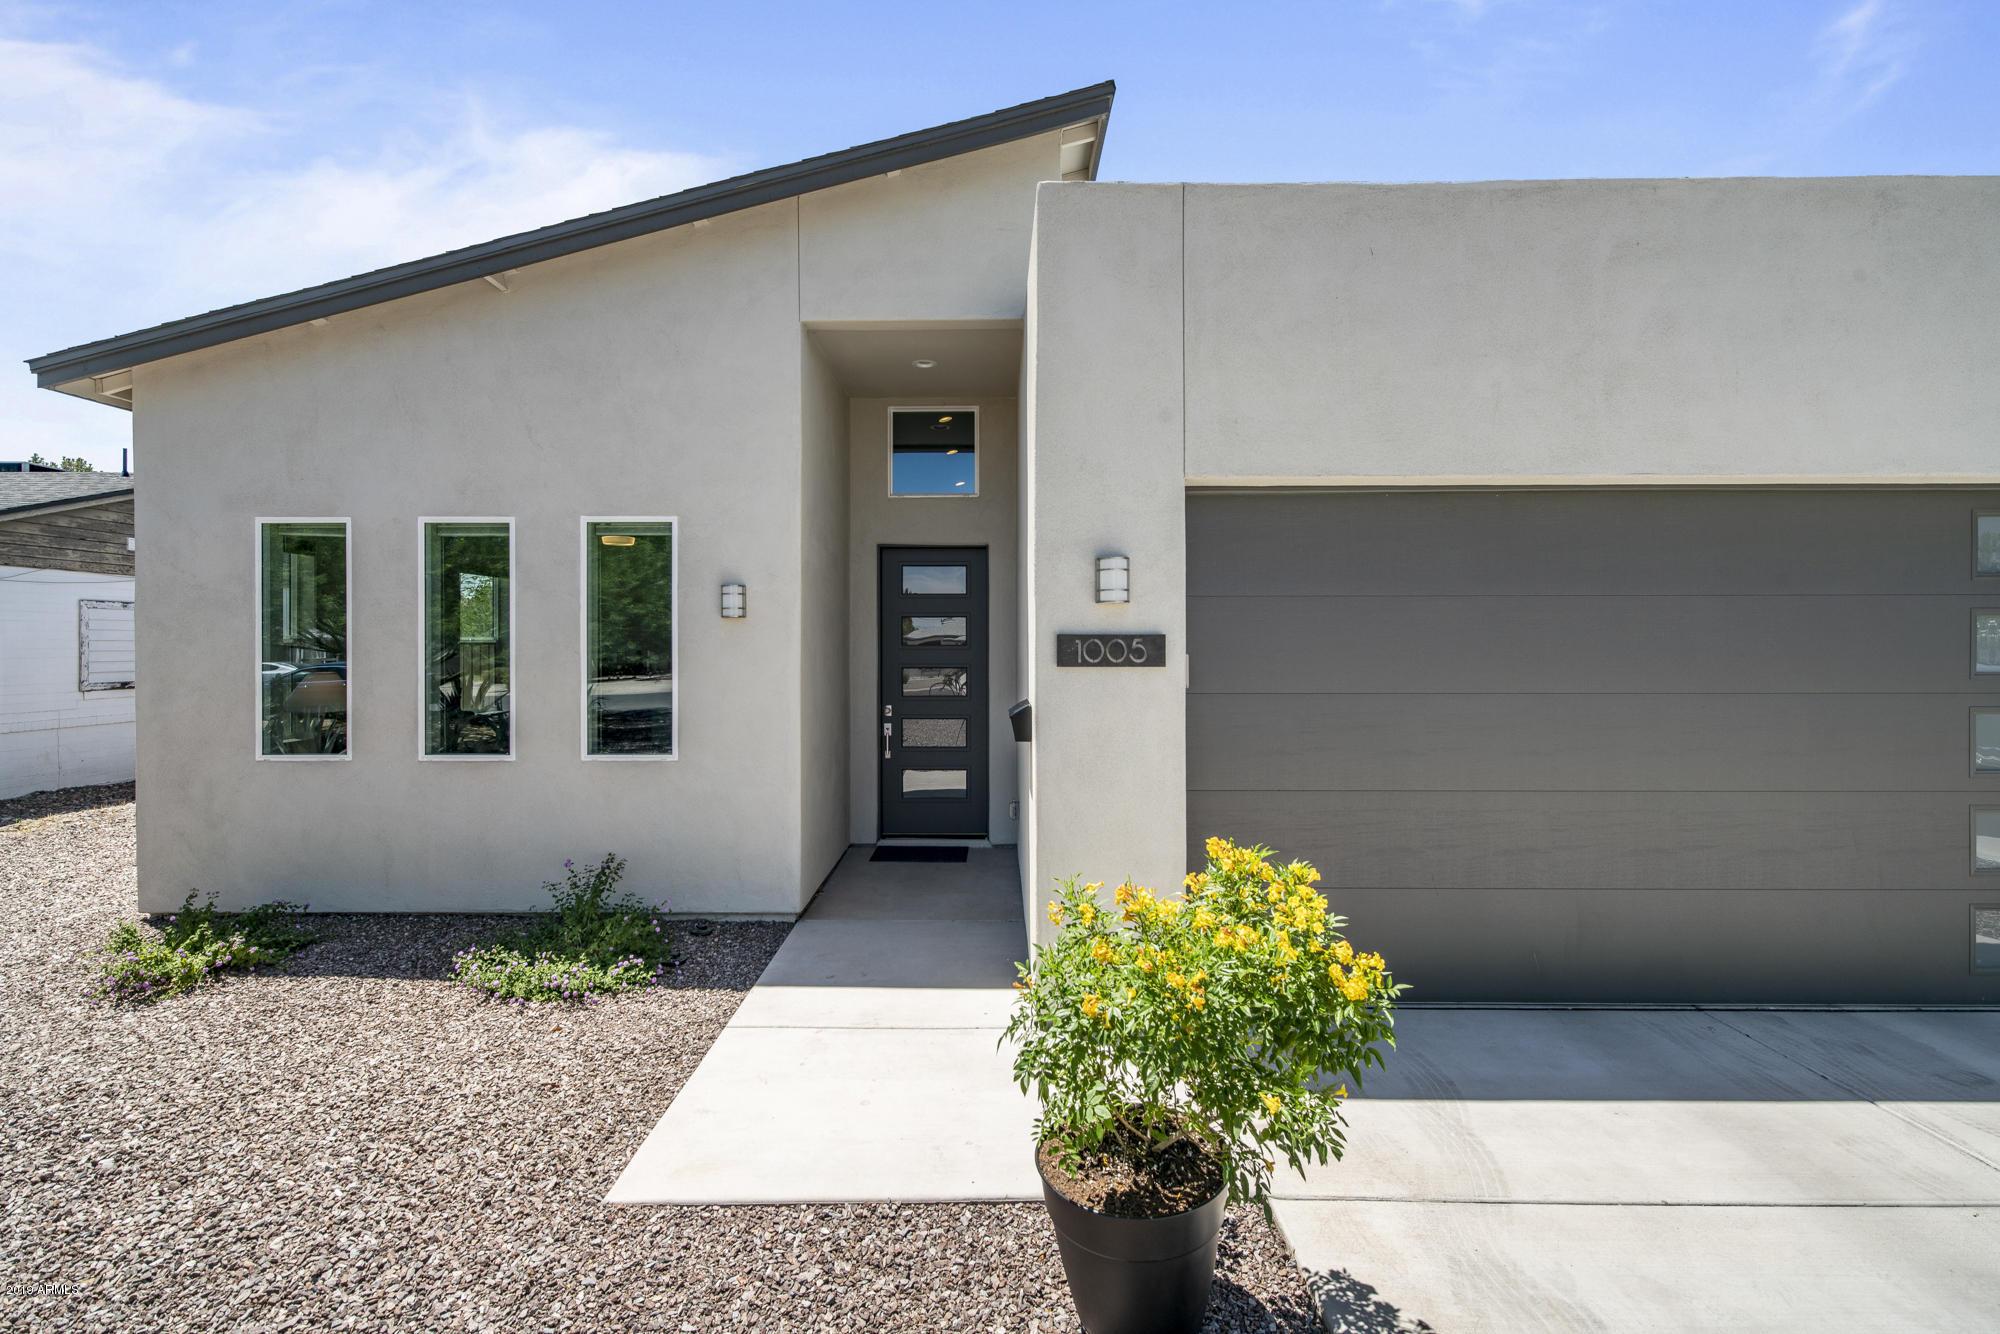 Photo of 1005 E WELDON Avenue, Phoenix, AZ 85014